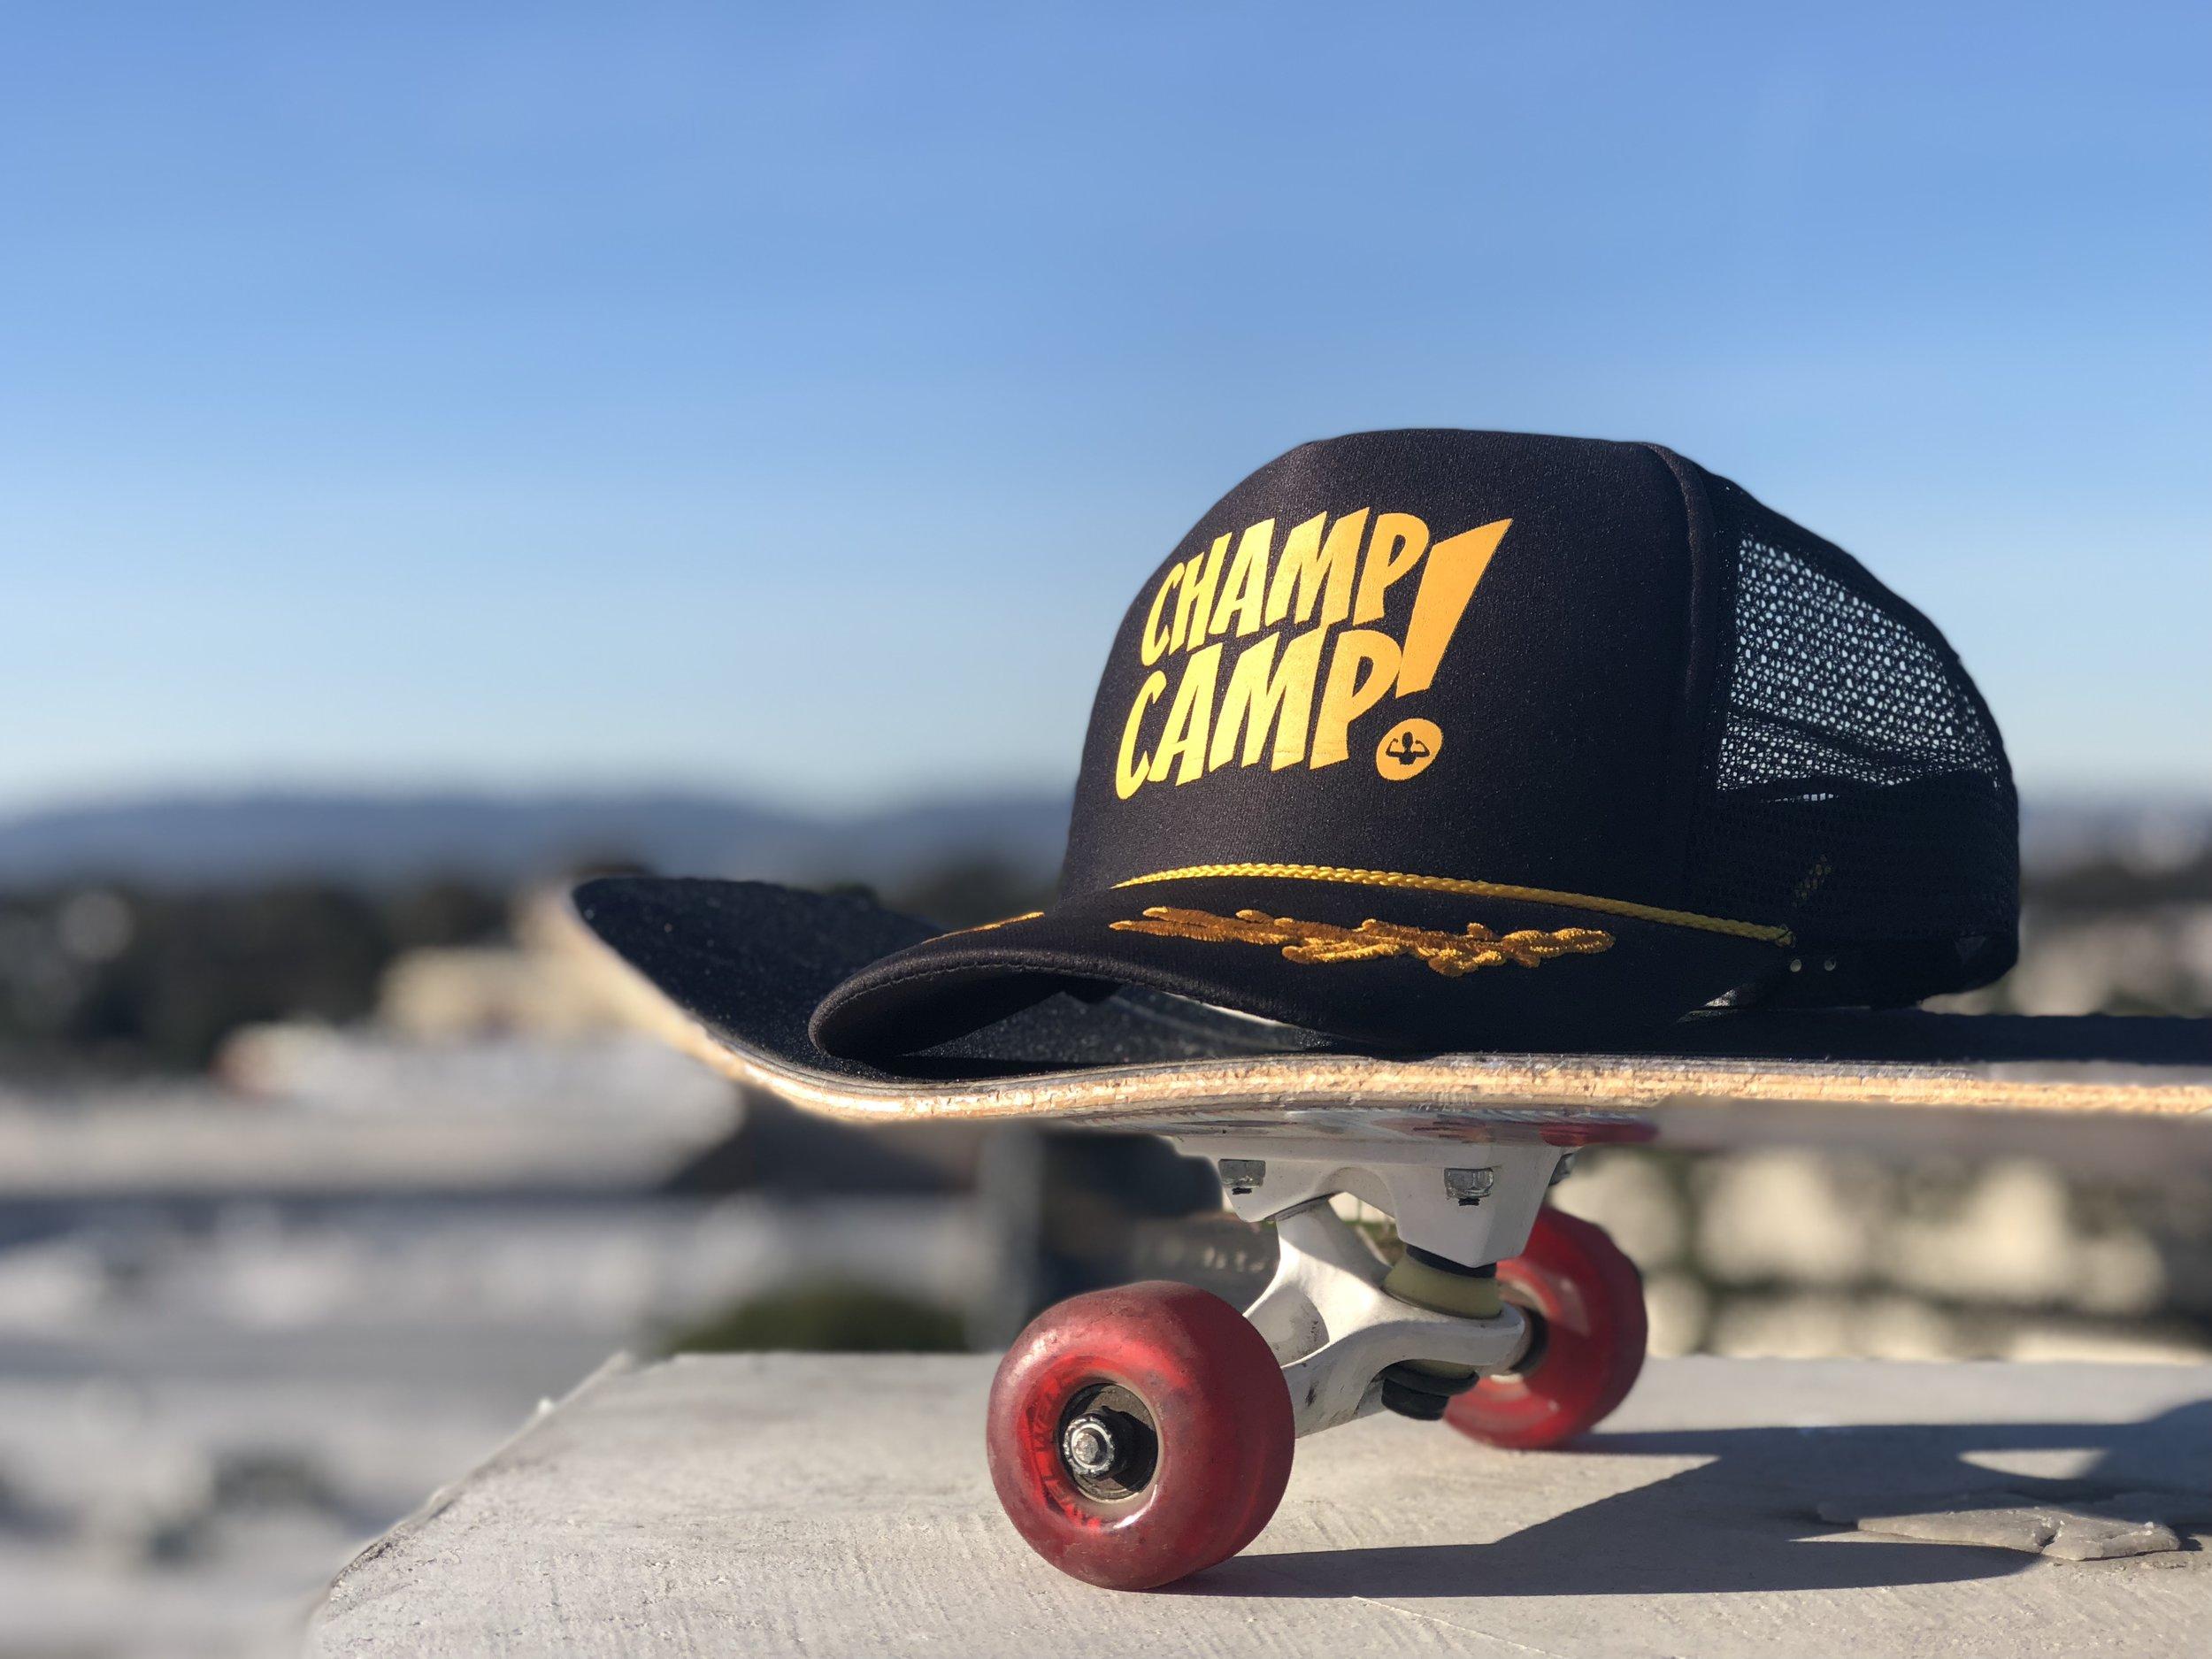 Champ SKATE Camp - A comprehinsive instructional skateboard camp experience in El Segundo, California!